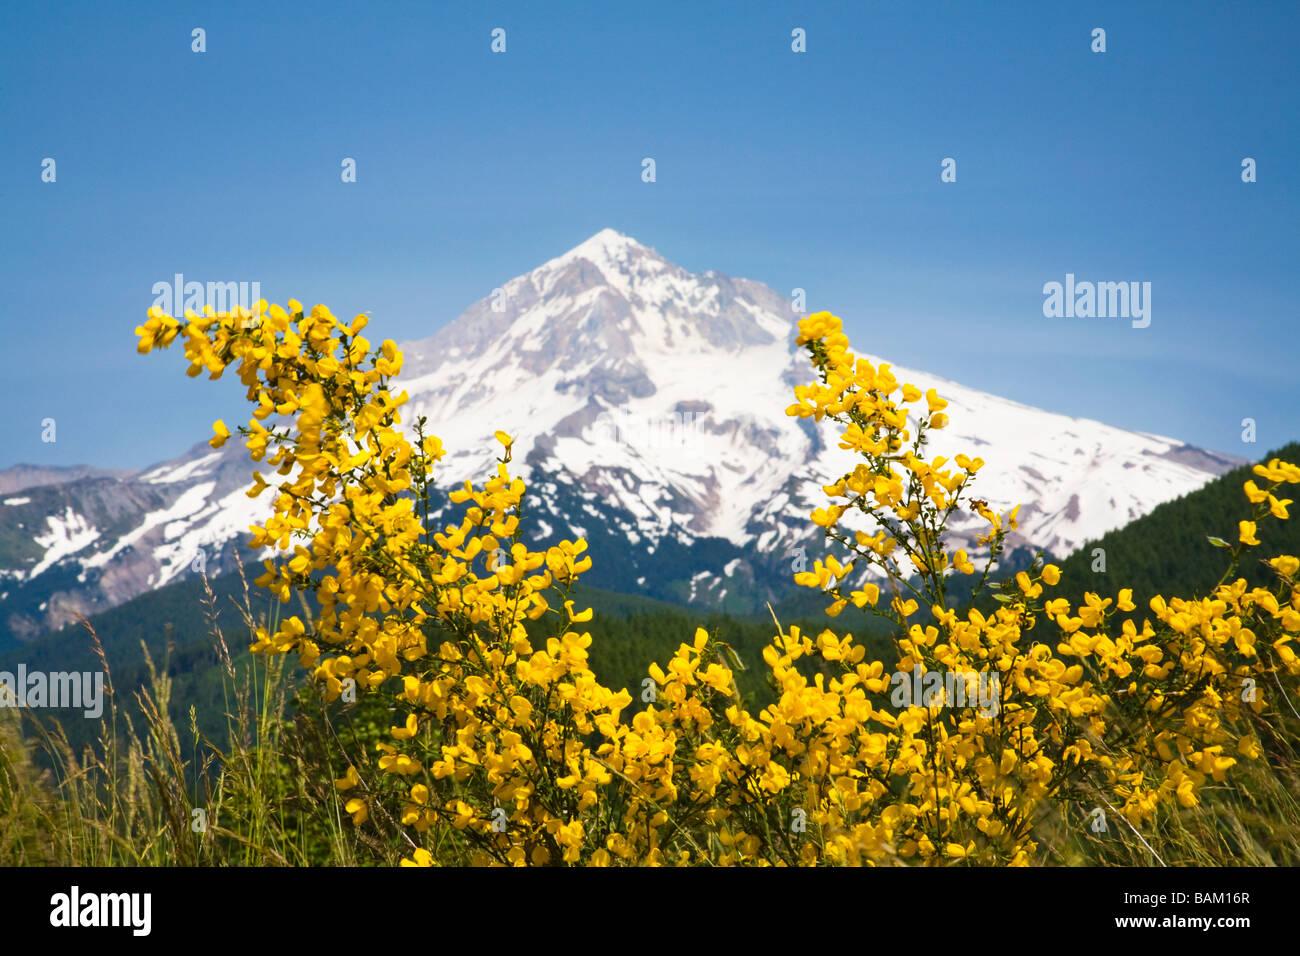 Lolo pass and mount hood - Stock Image